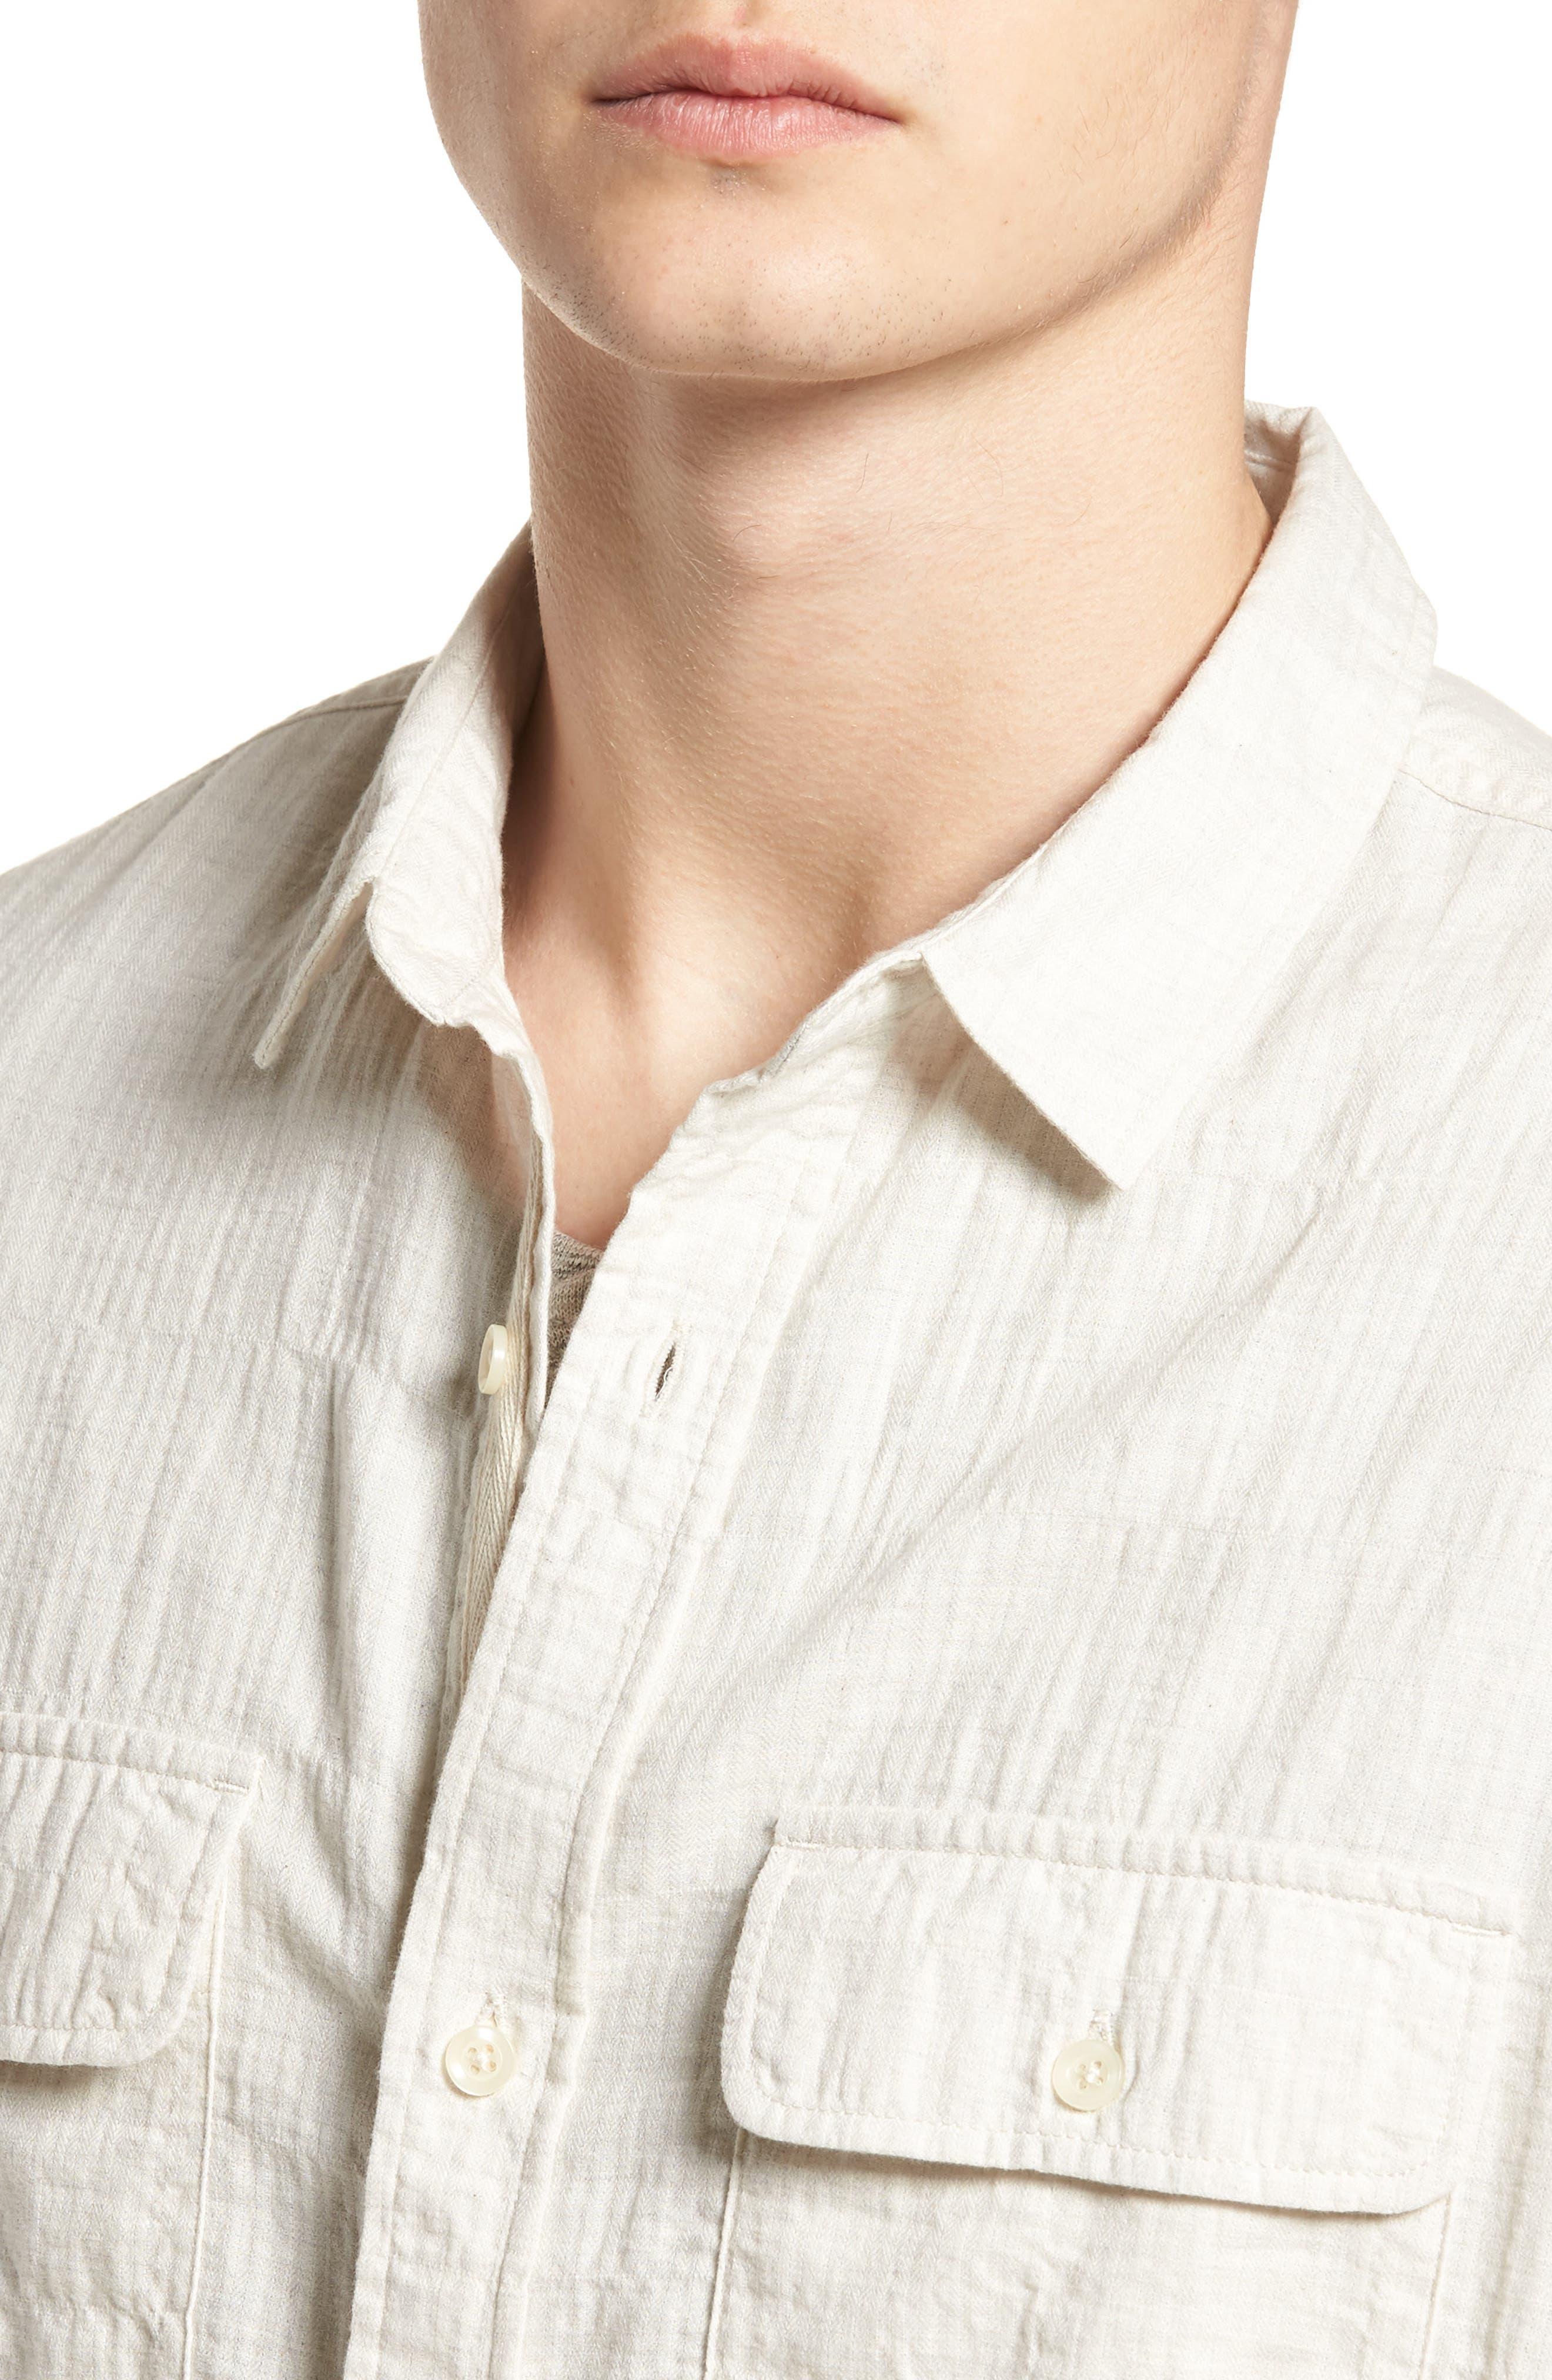 Herringbone Longline Shirt,                             Alternate thumbnail 5, color,                             Ivory Egret Herringbone